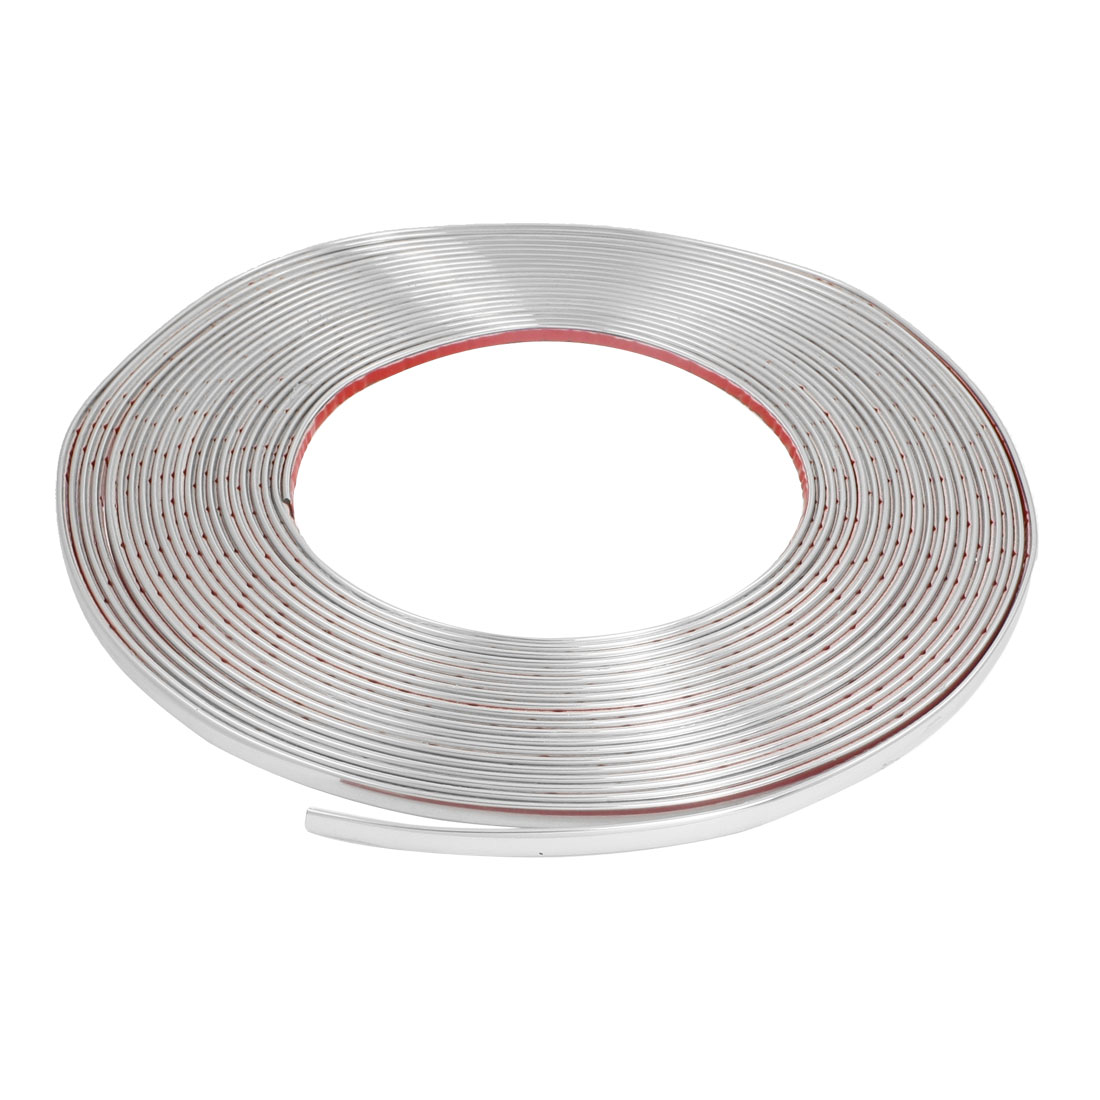 Car Window Silver Tone Soft PVC Adhesive Back Moulding Trim Strip Line 15M x 8mm